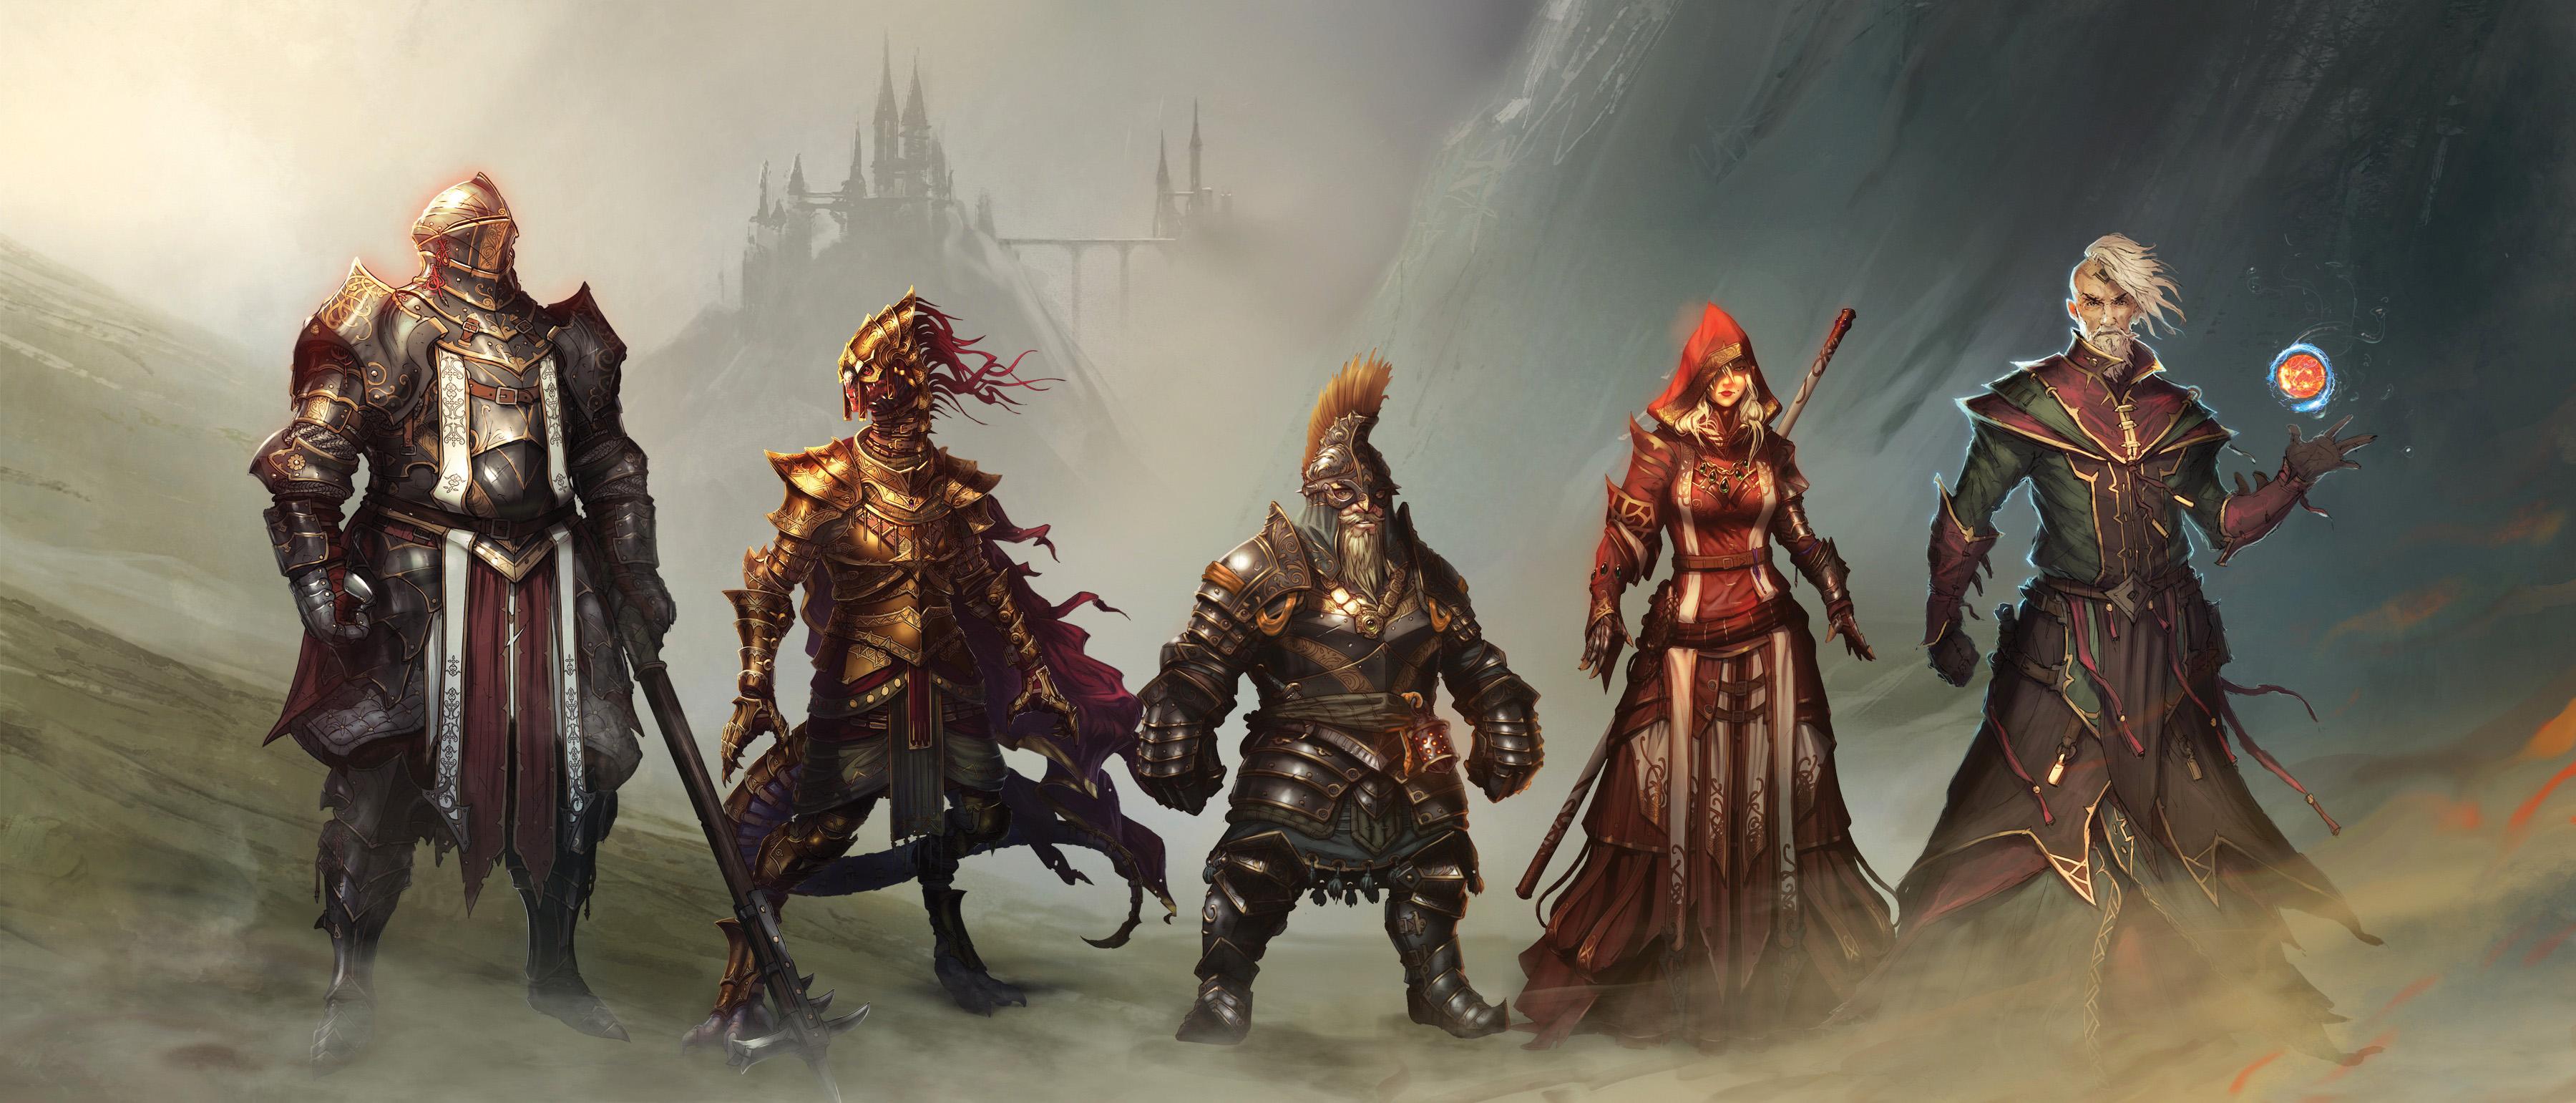 The making of Divinity: Original Sin 2 | PC Gamer